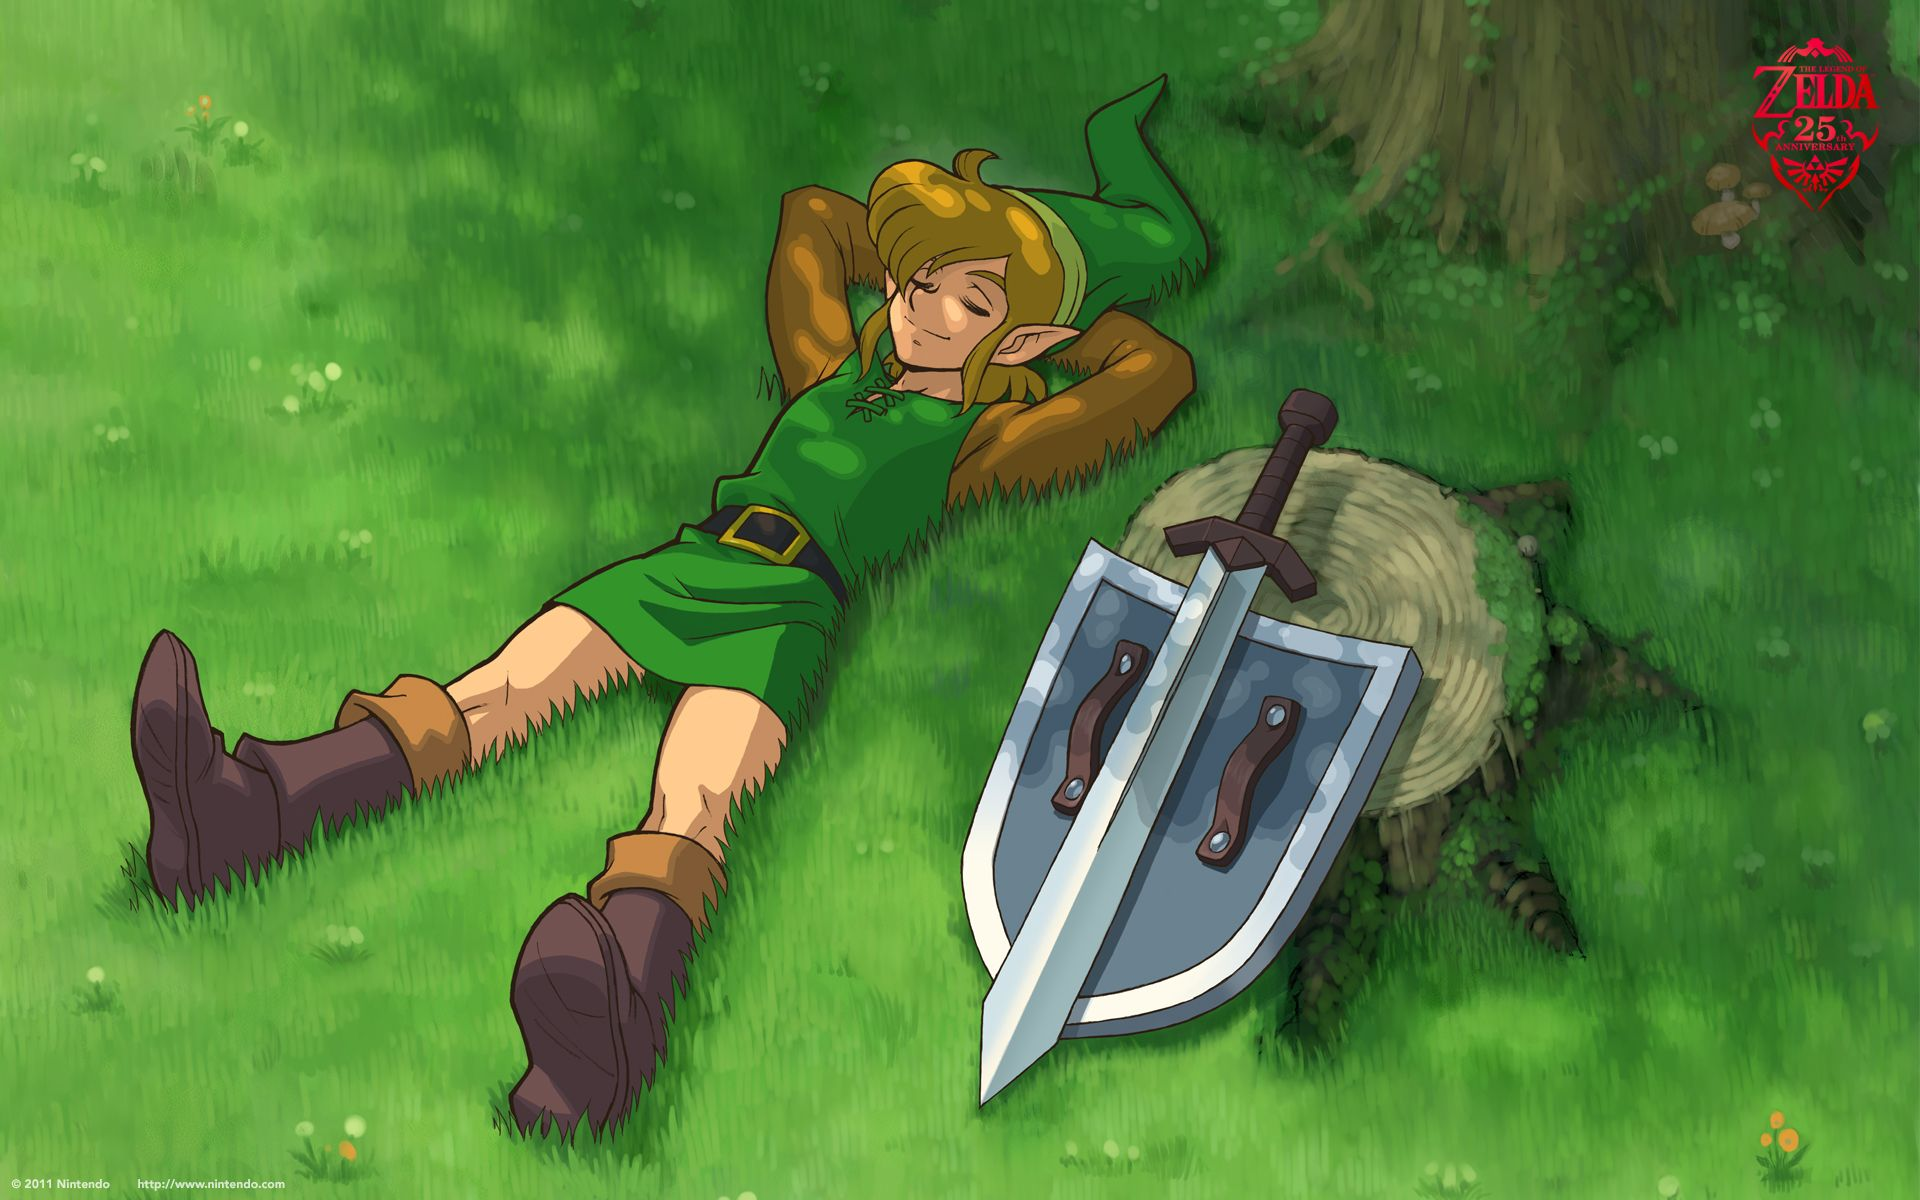 The Legend Of Zelda Wallpaper 25th Anniversary Wallpapers Legend Of Zelda Characters Legend Of Zelda Legend